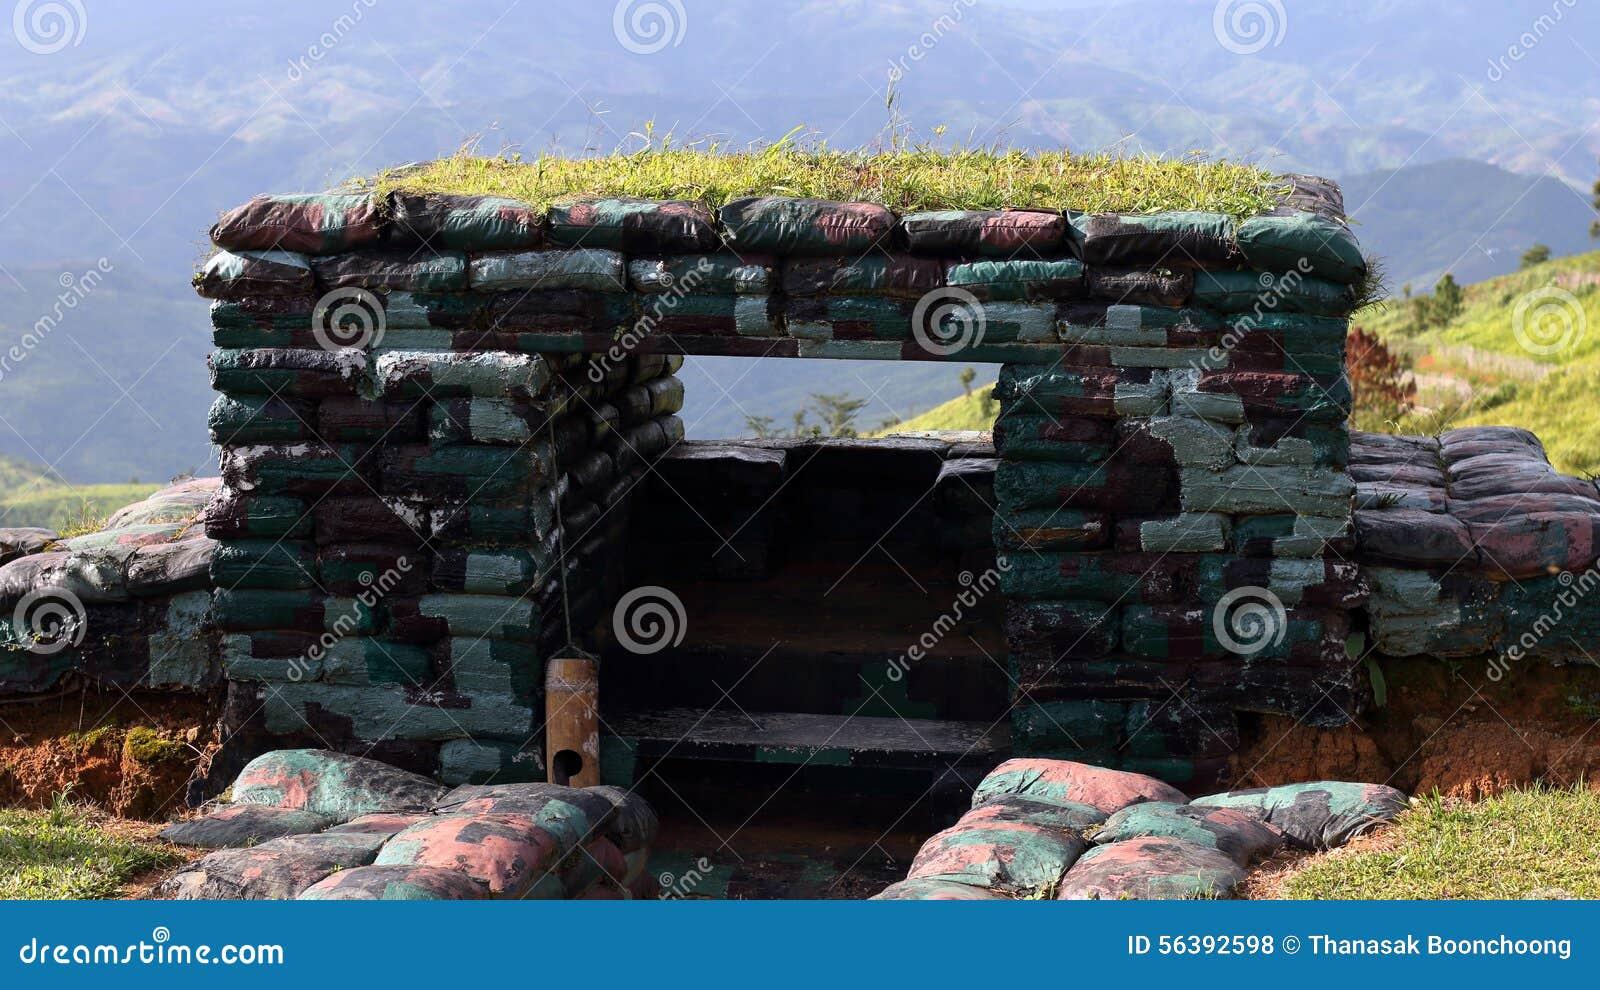 Zombie Squad • View topic - Sandbag Bunker